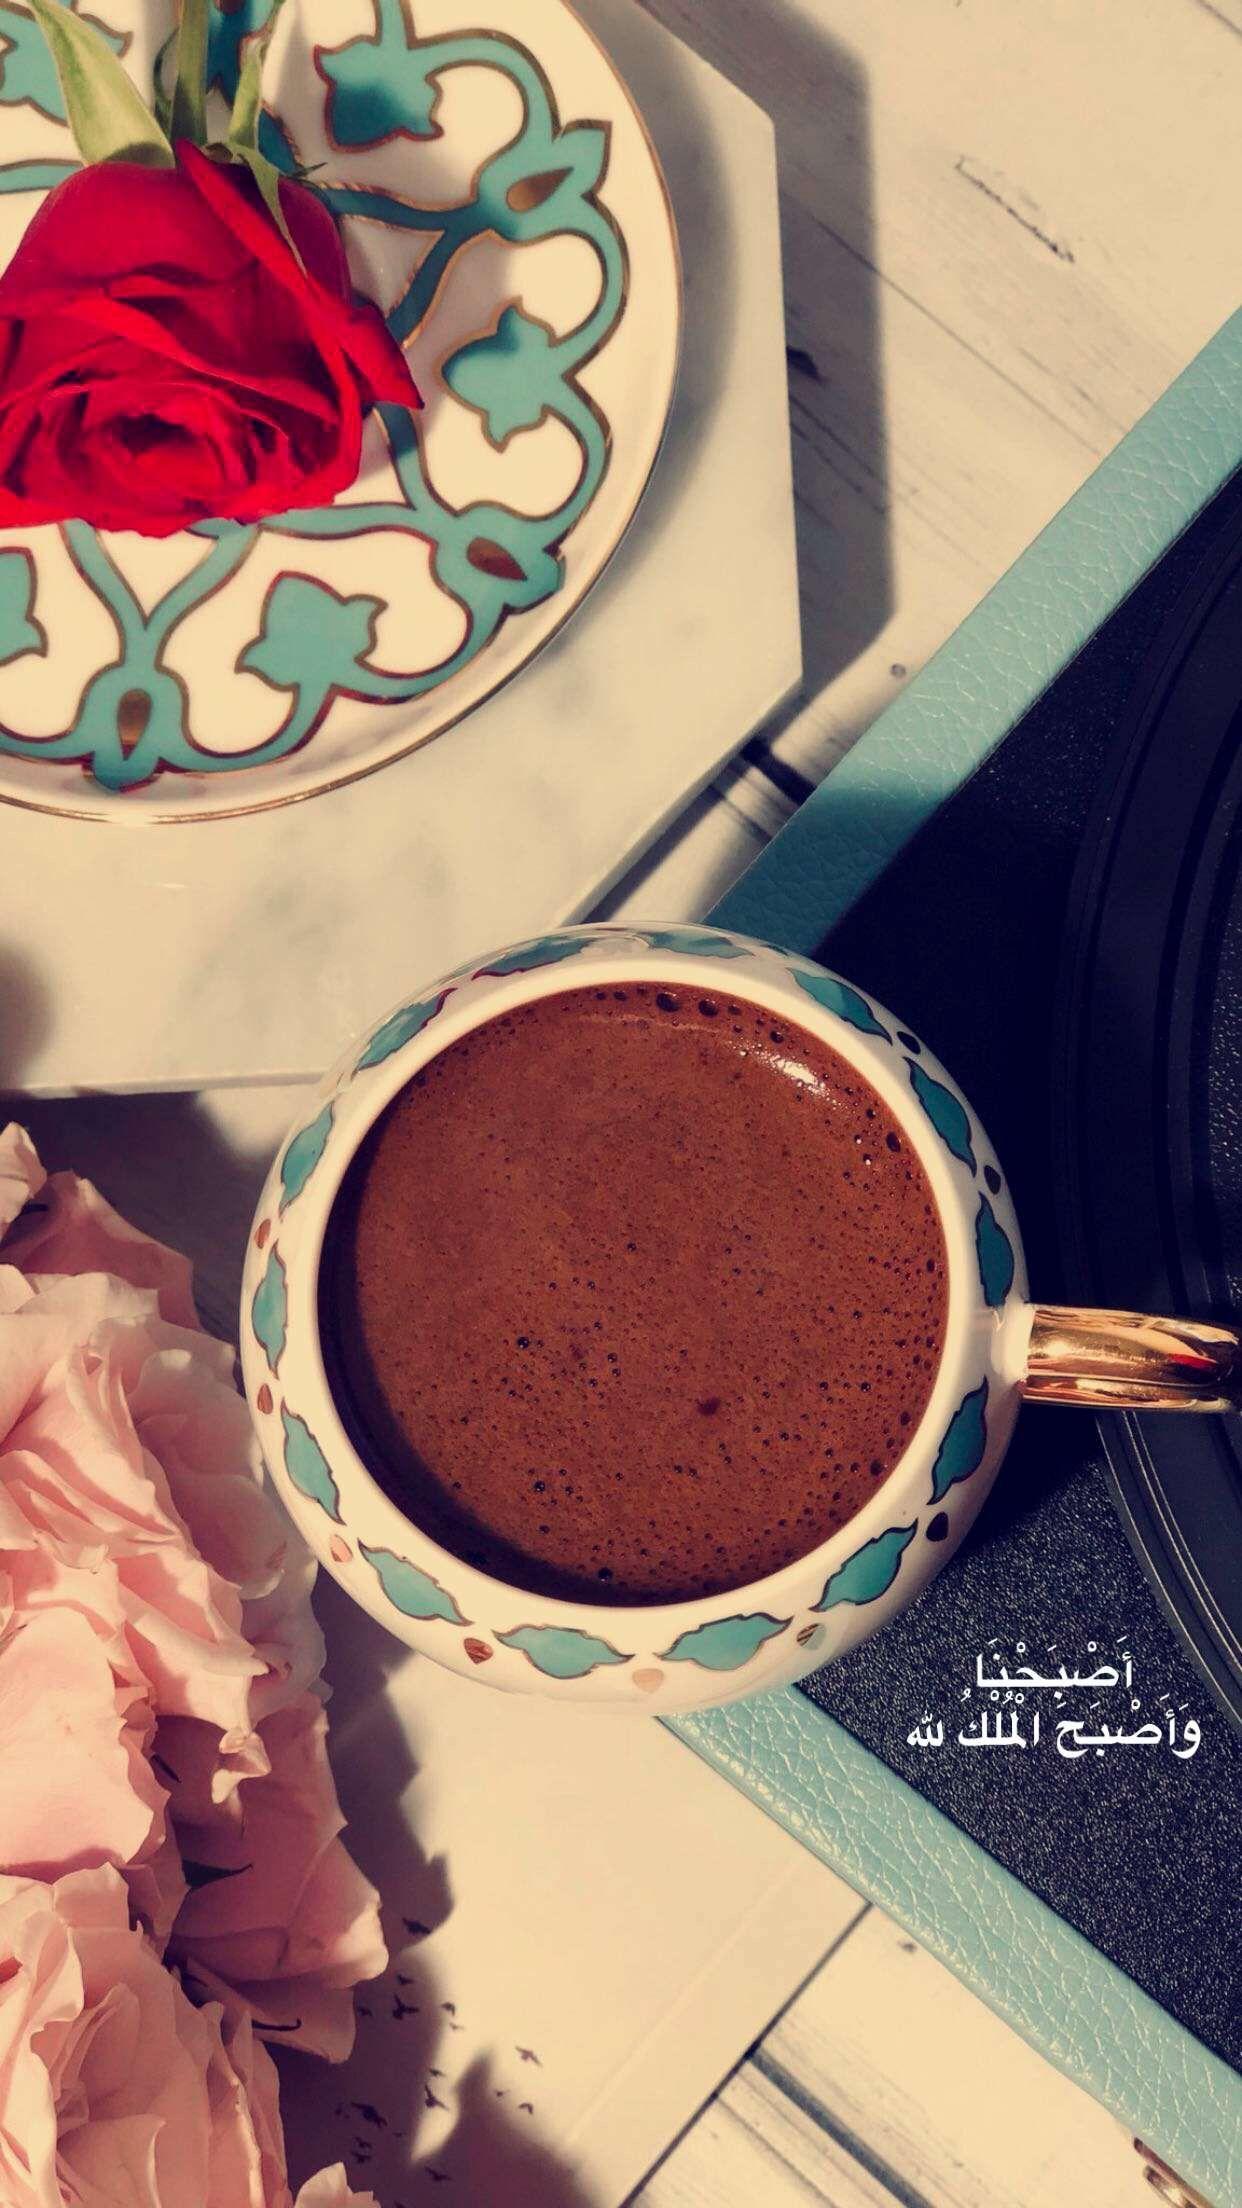 Pin By موضي البليهد On سناب موضي البليهد Food And Drink Coffee Time Food